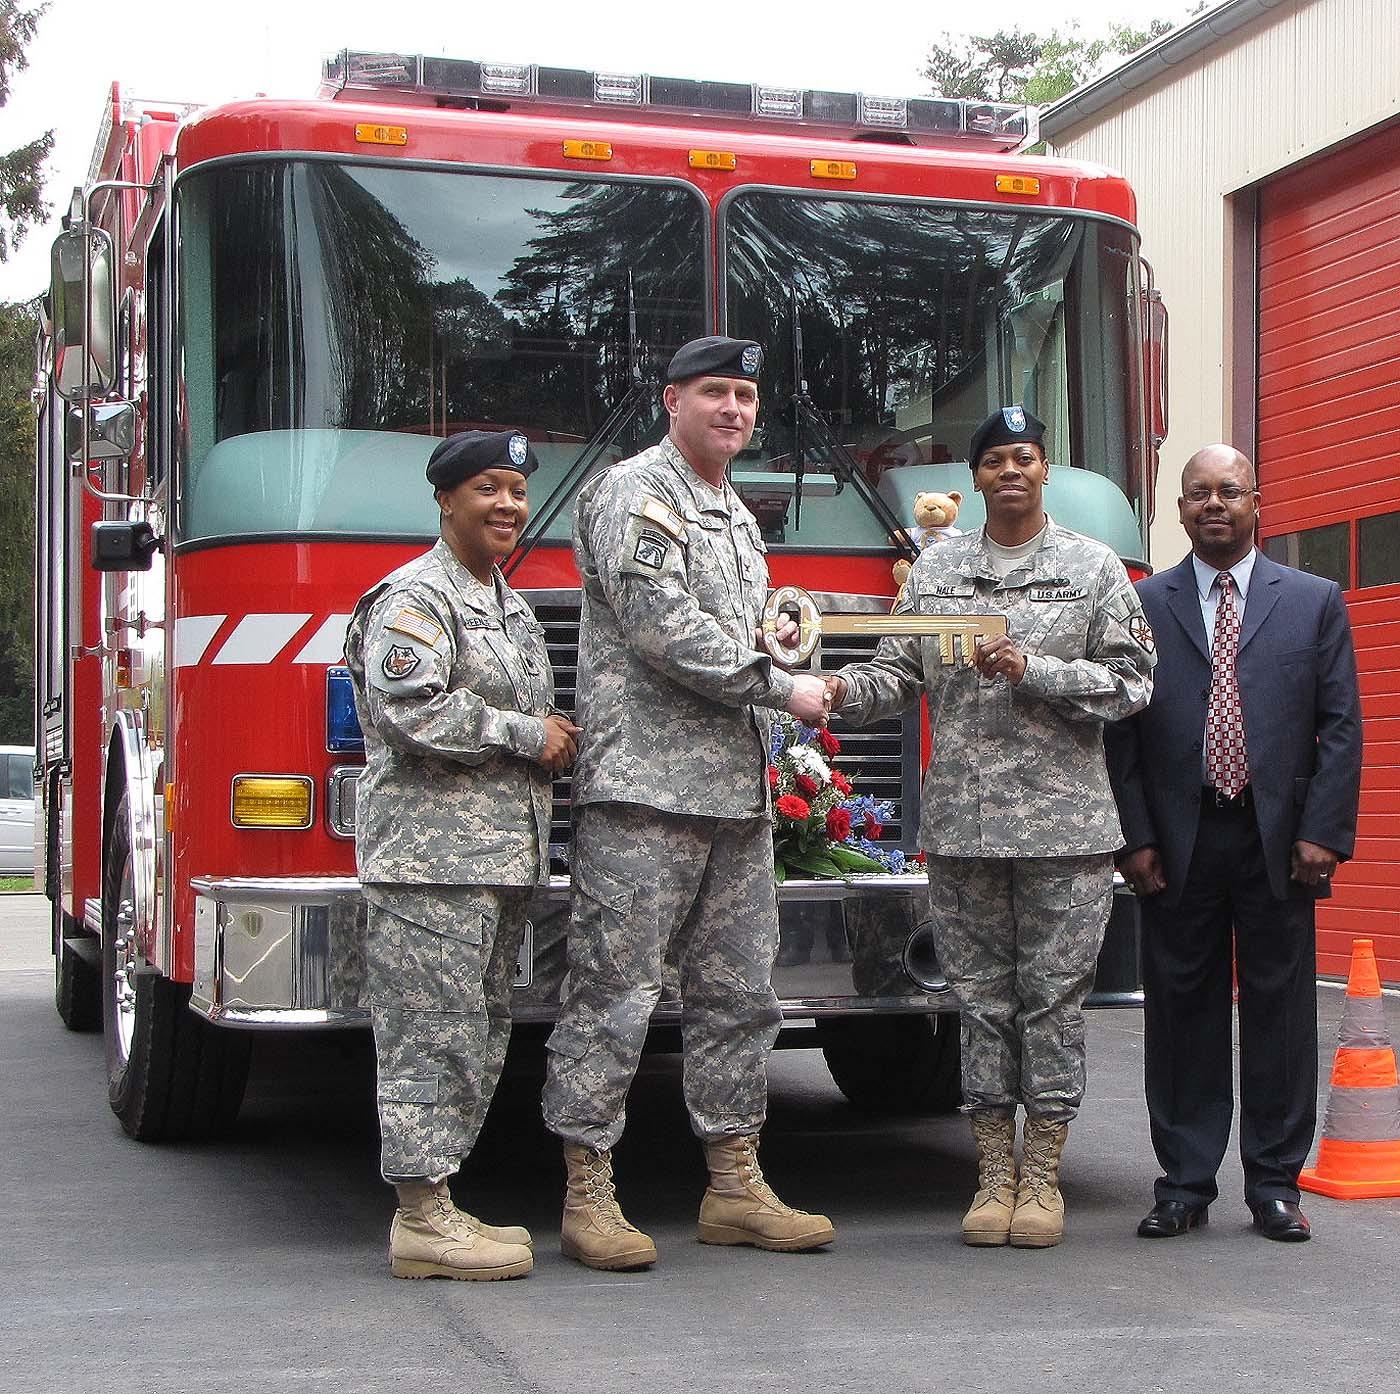 Usag Kaiserslautern Receives Revamped Fire Trucks